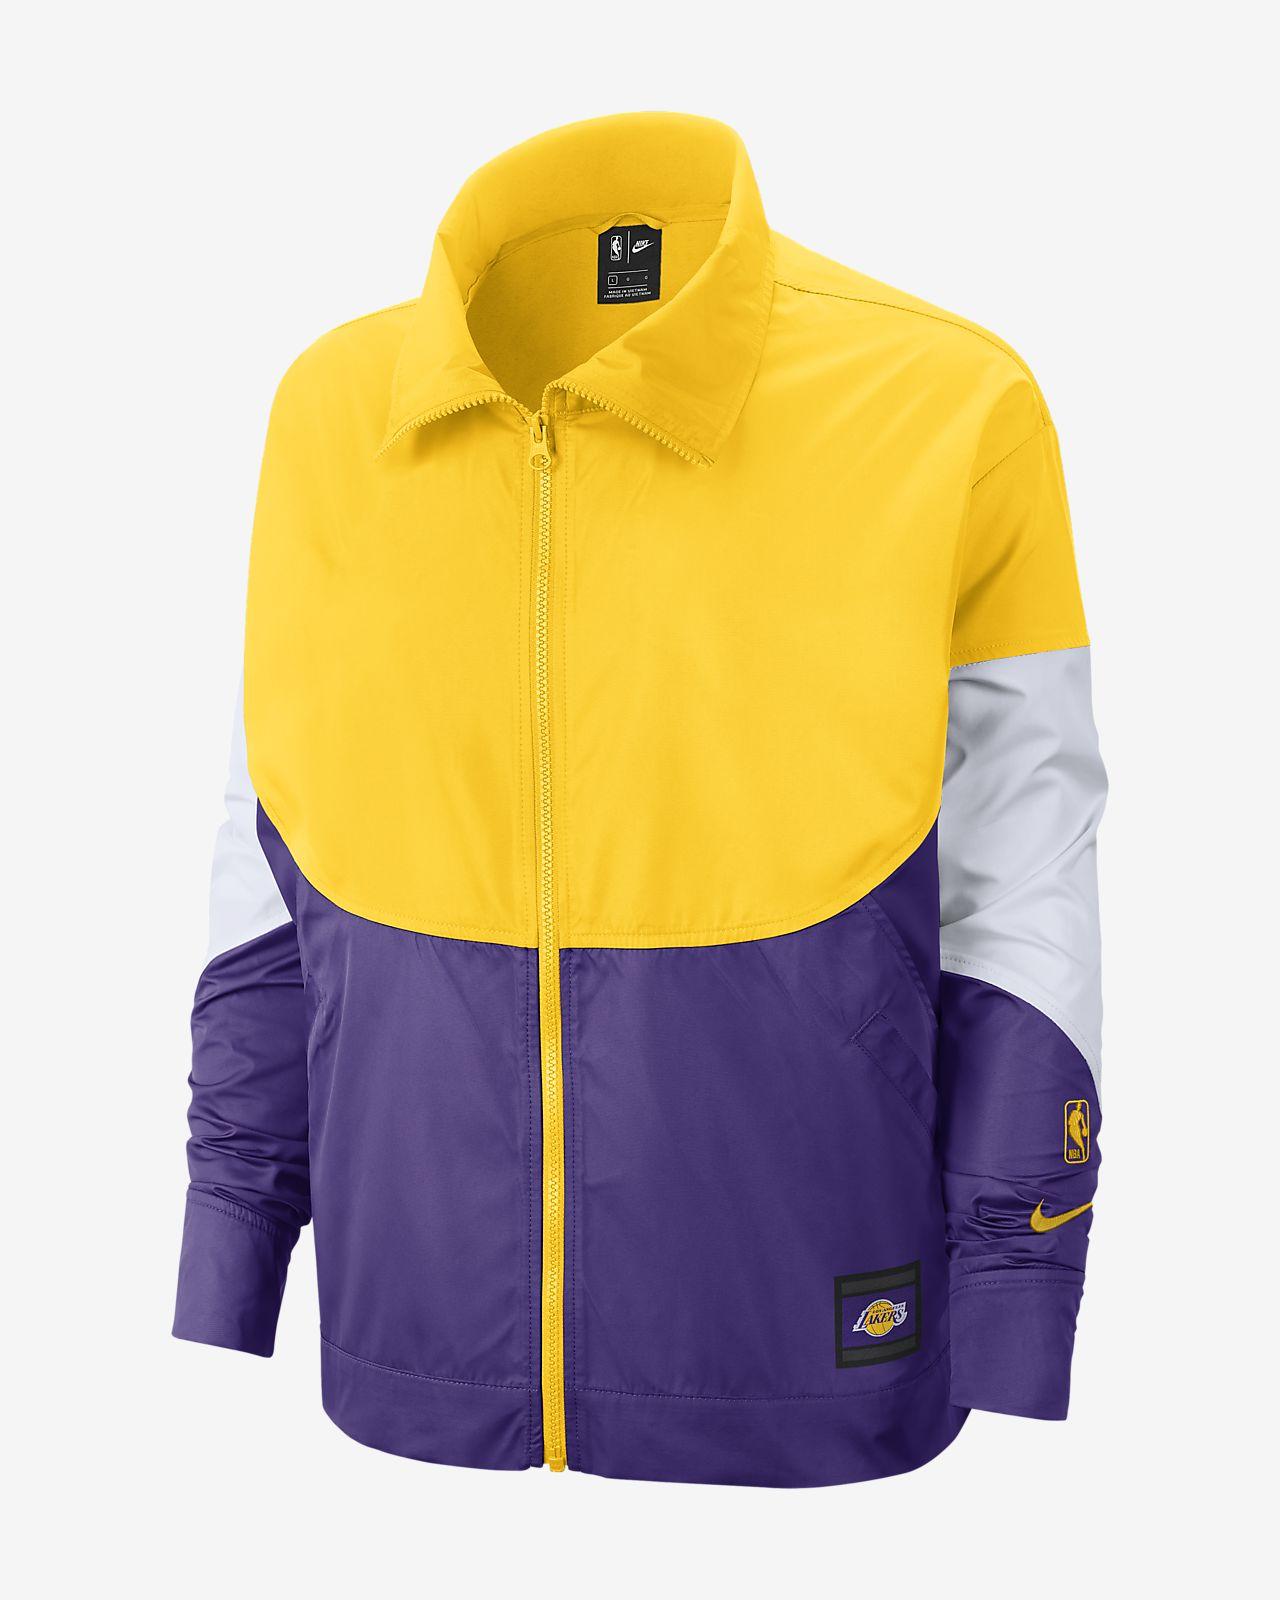 Los Angeles Lakers Nike NBA-Damenjacke